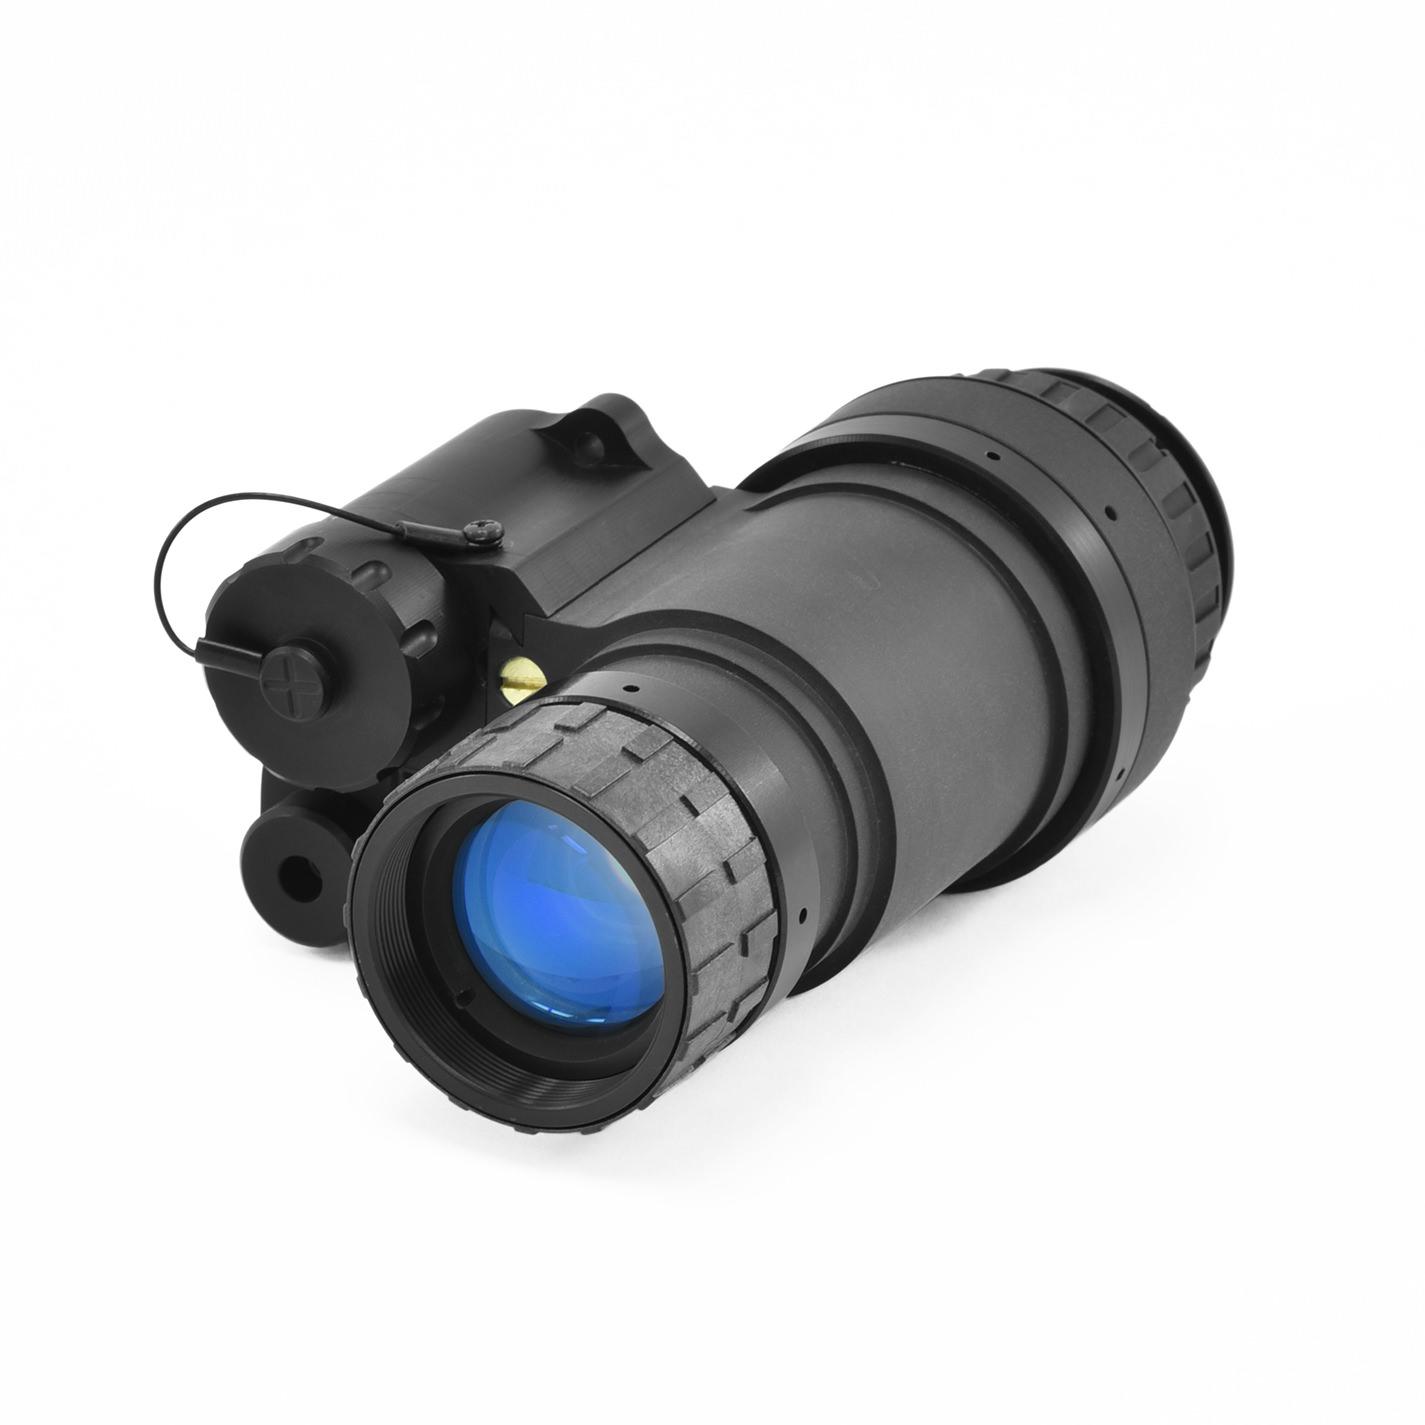 BMNVD Night Vision Binocular/Monocular